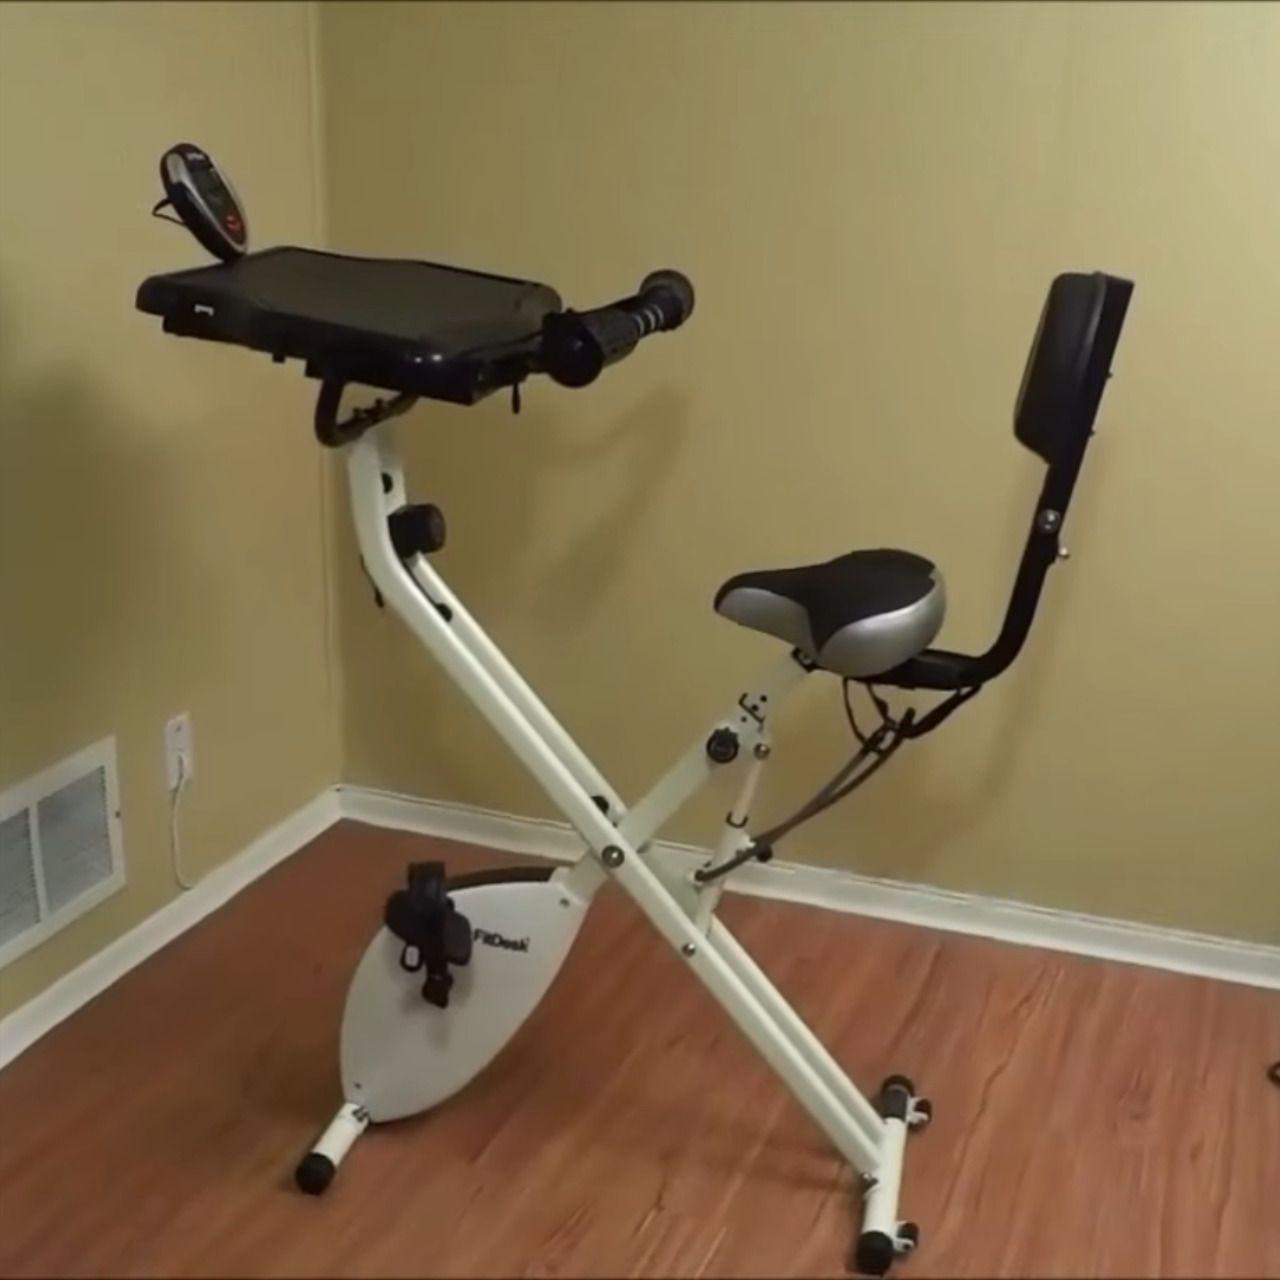 Craigslist Dallas Electronics Biking Workout Exercise Bikes Bike Stand